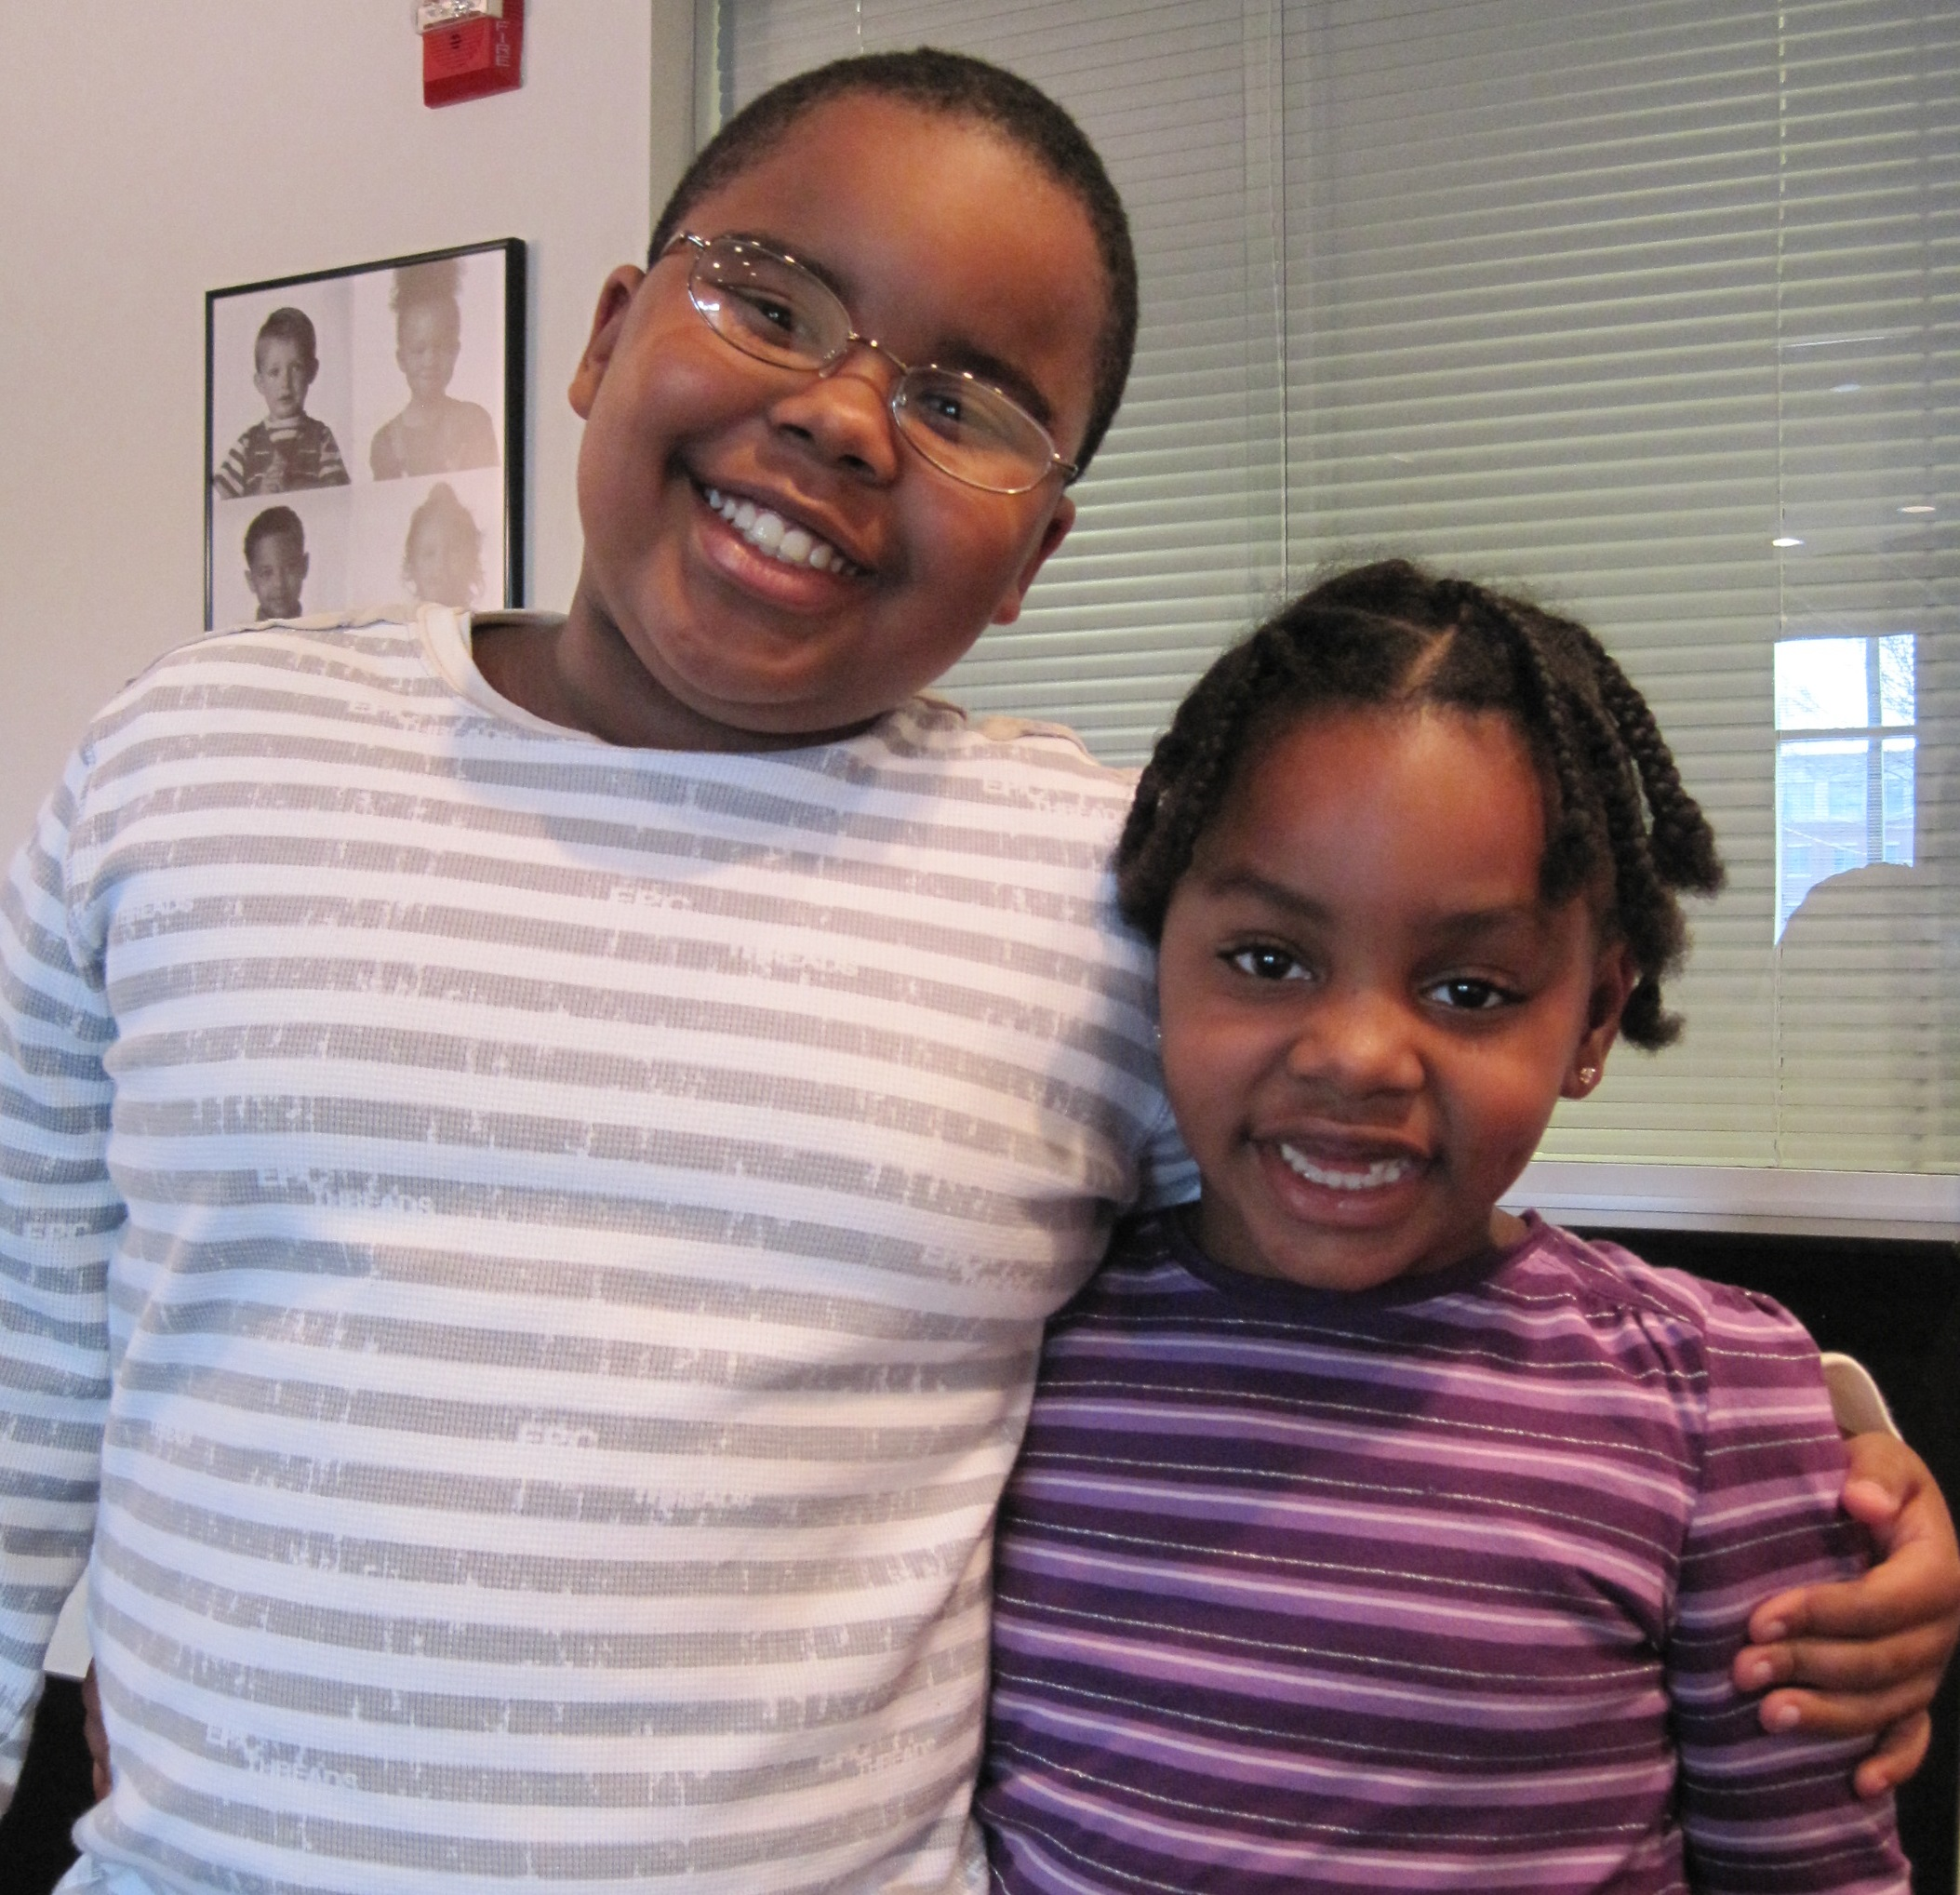 Children's Eyeglass Fitting